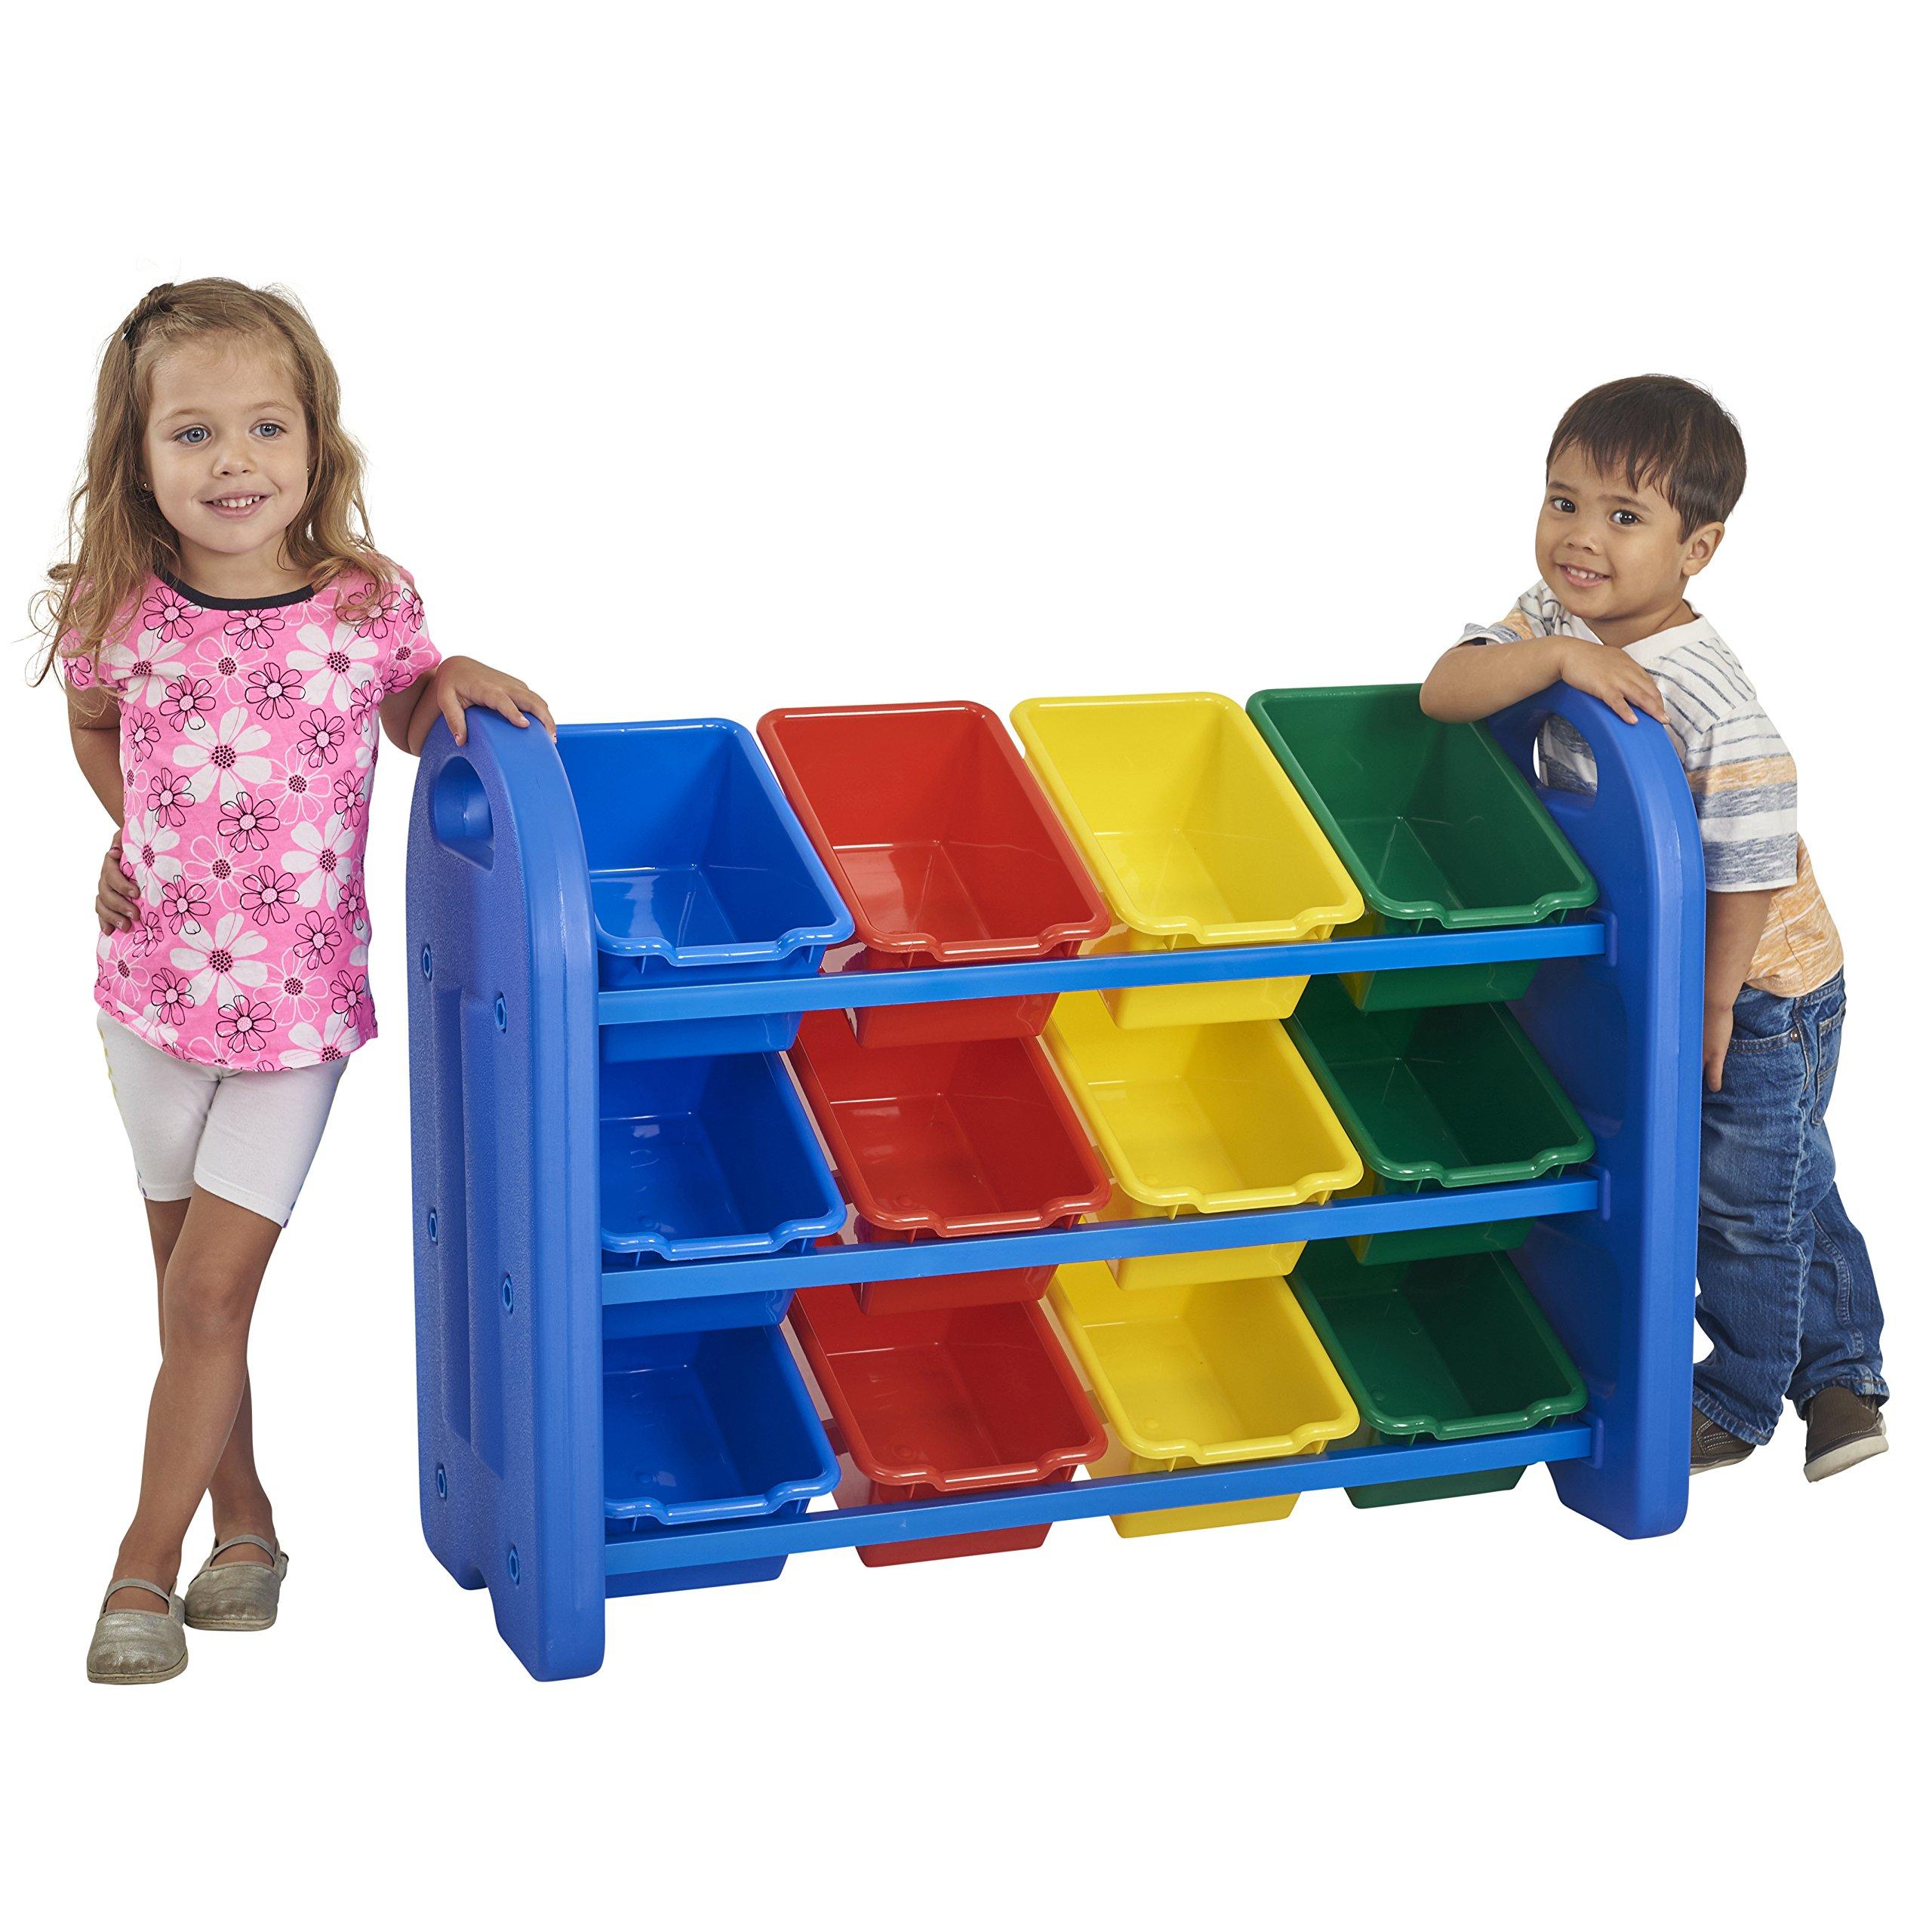 ECR4Kids 3Tier Toy Storage Organizer for Kids, Blue with 12 Assorted Color Bins by ECR4Kids